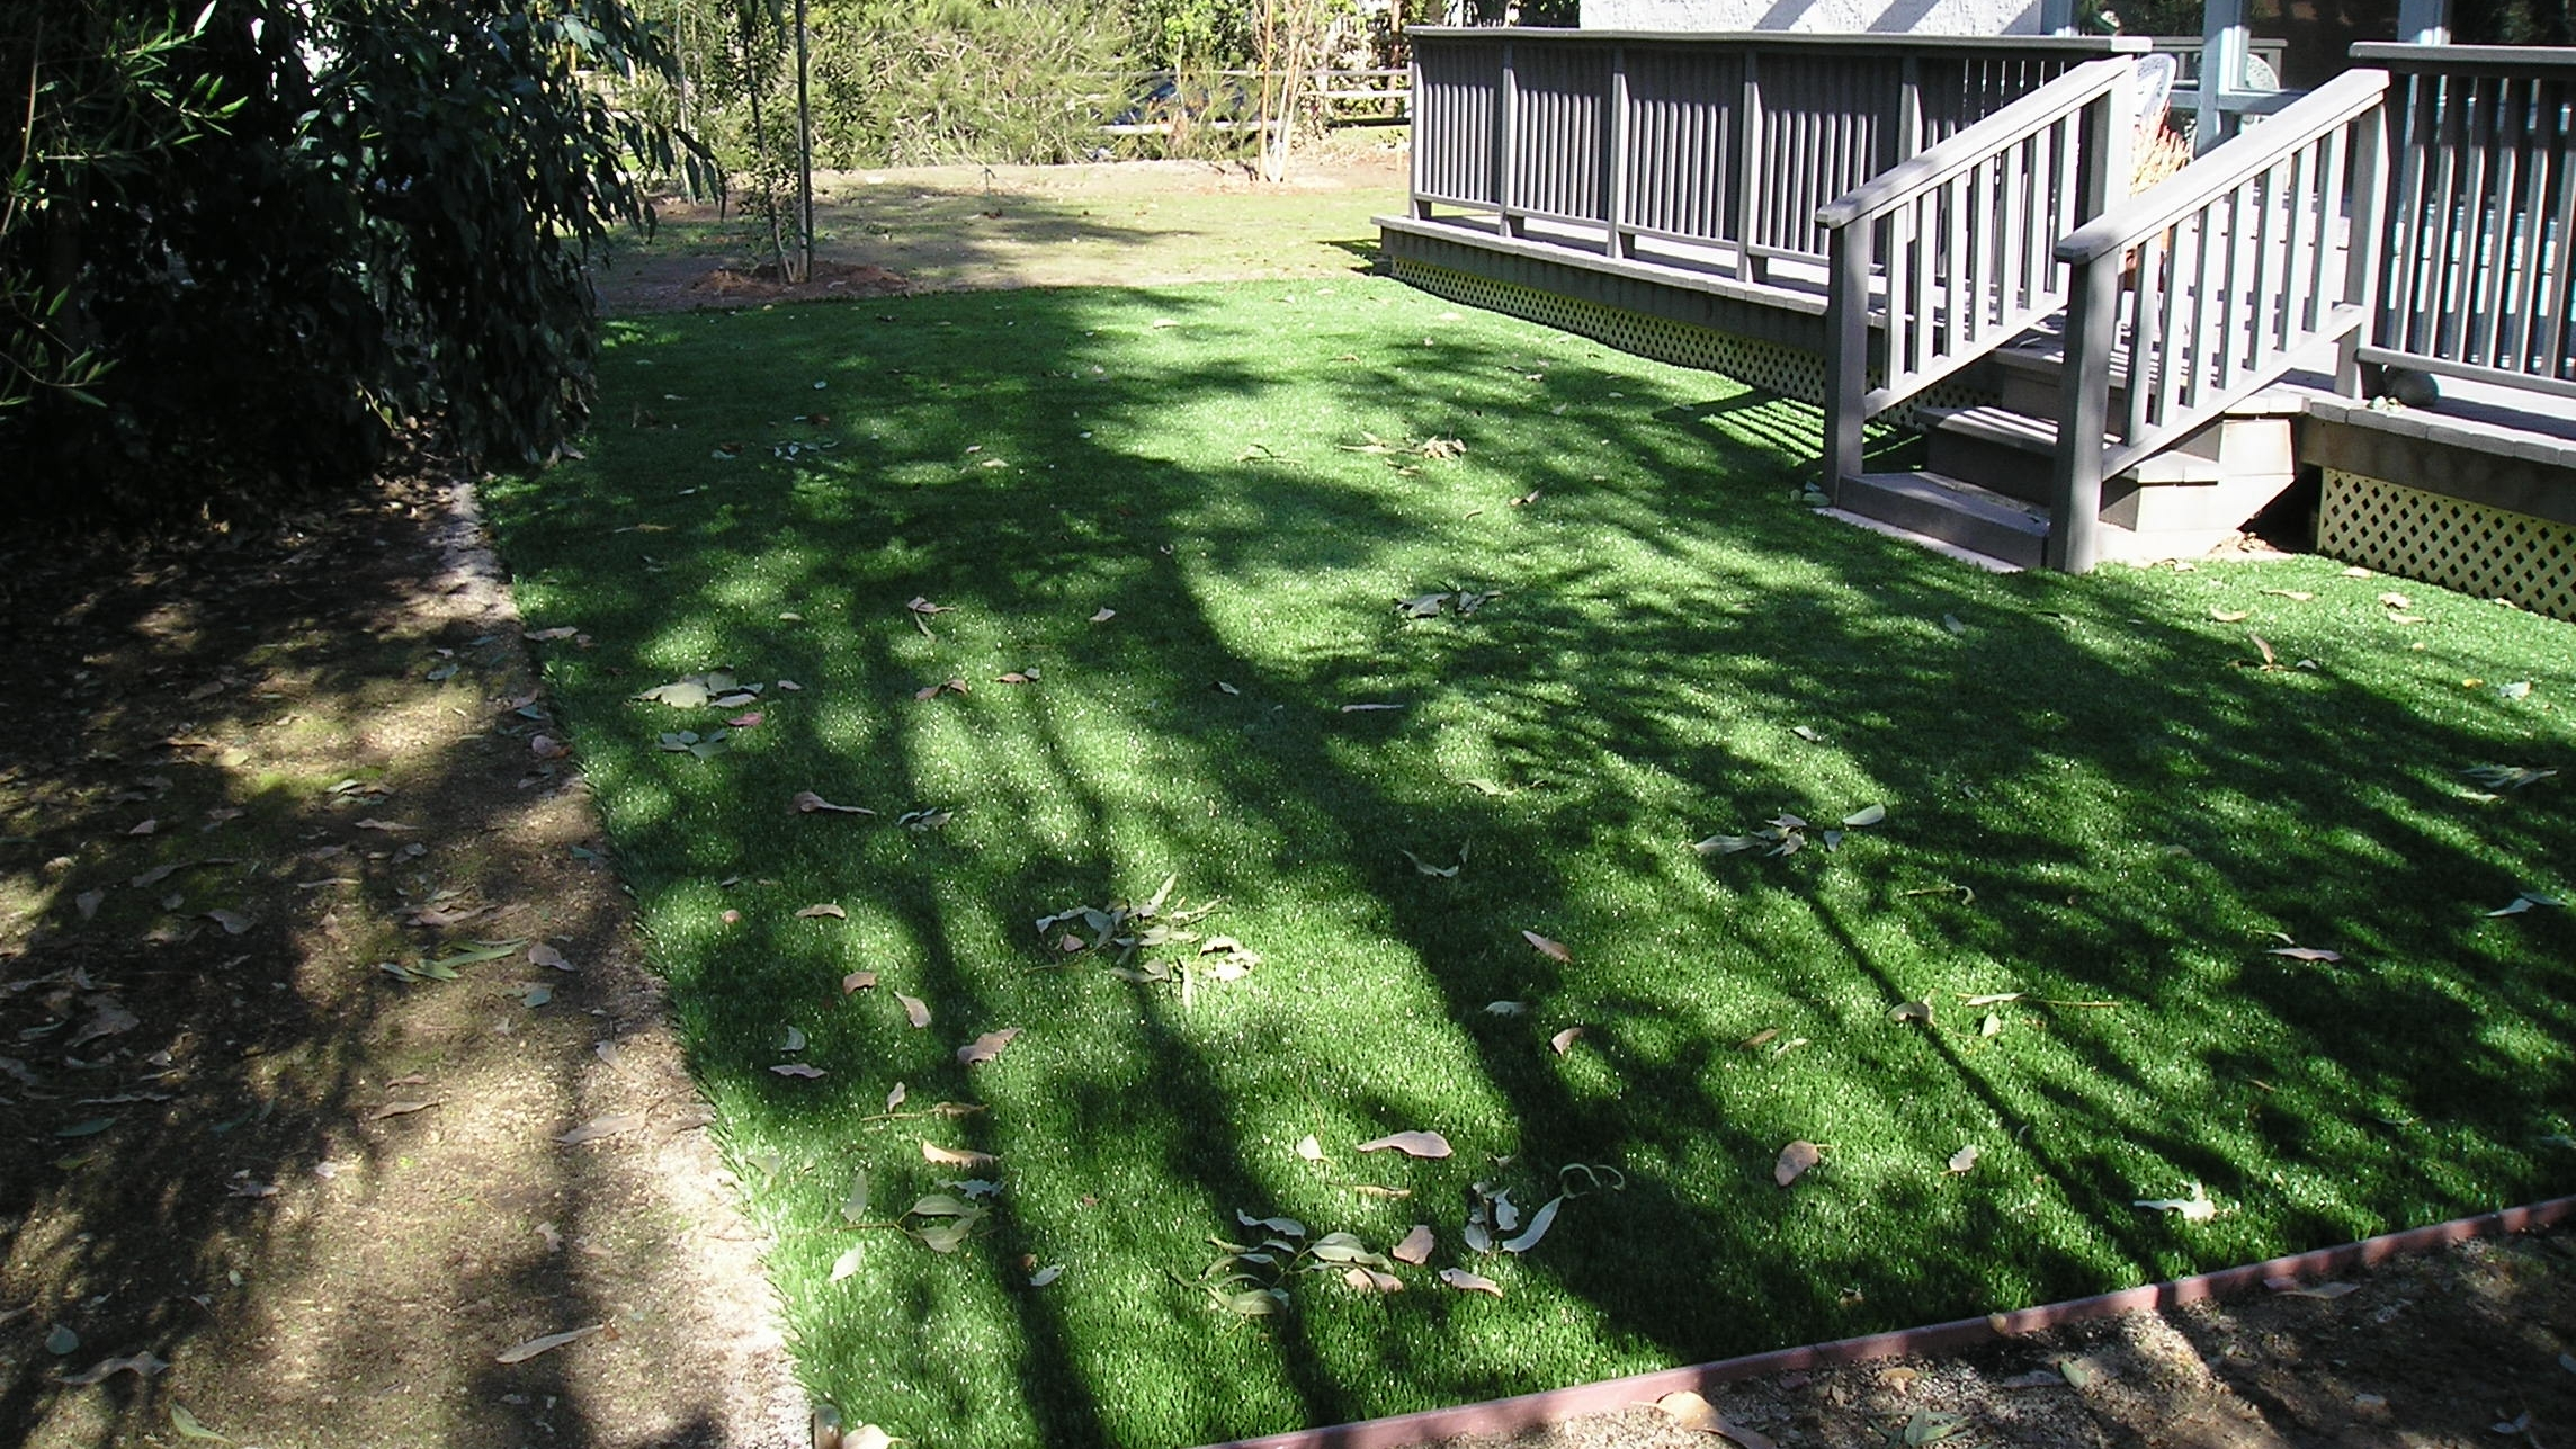 S Blade-90 fake grass for yard,backyard turf,turf backyard,turf yard,fake grass for backyard